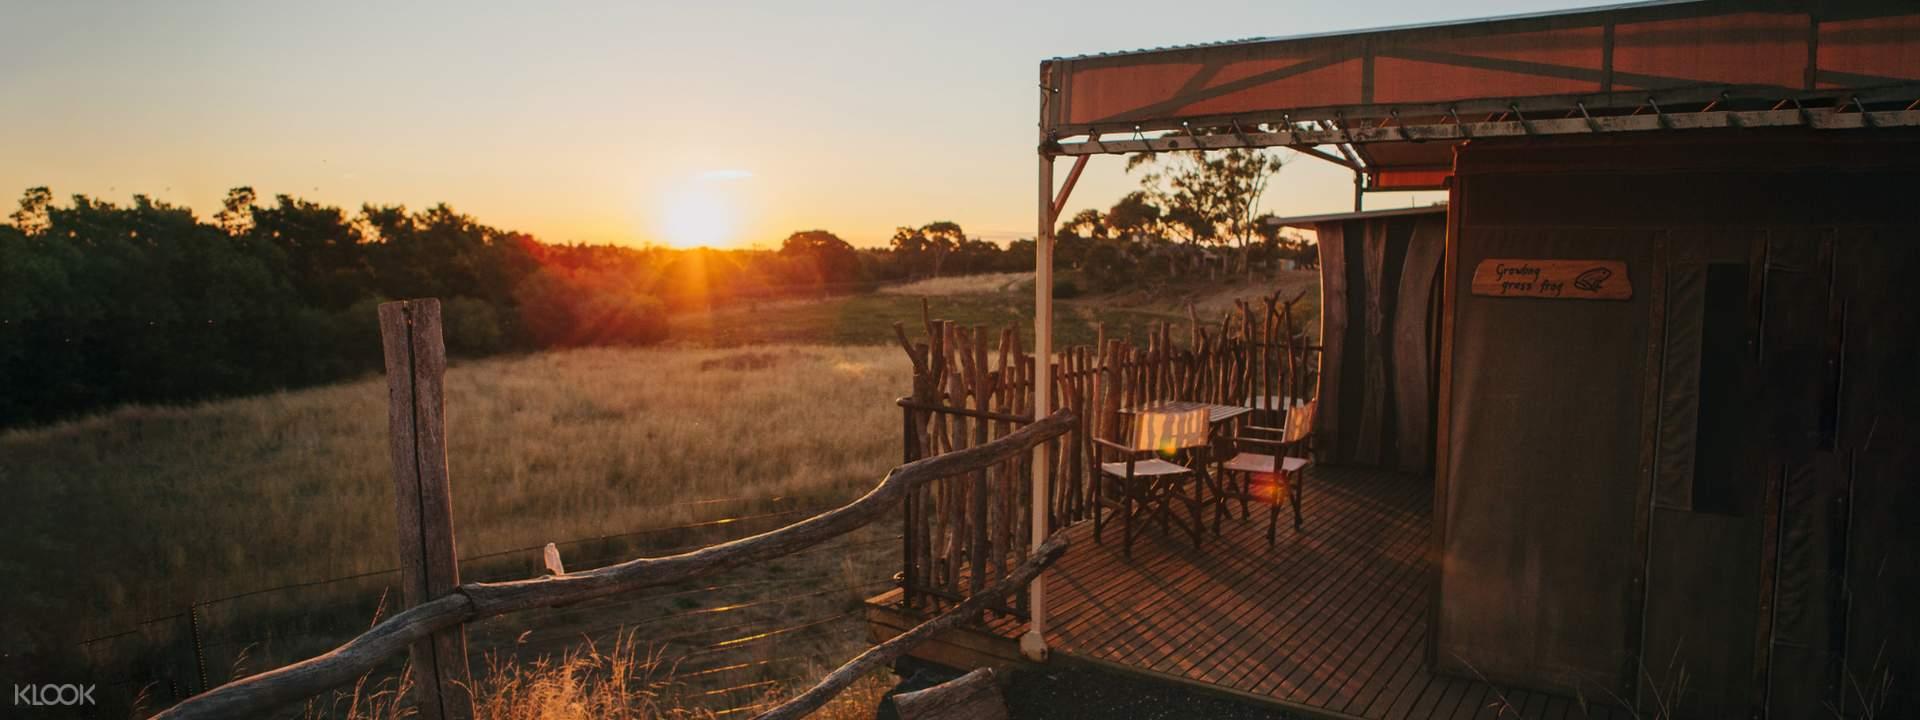 Slumber Safari and Family Off Road Experience at Werribee